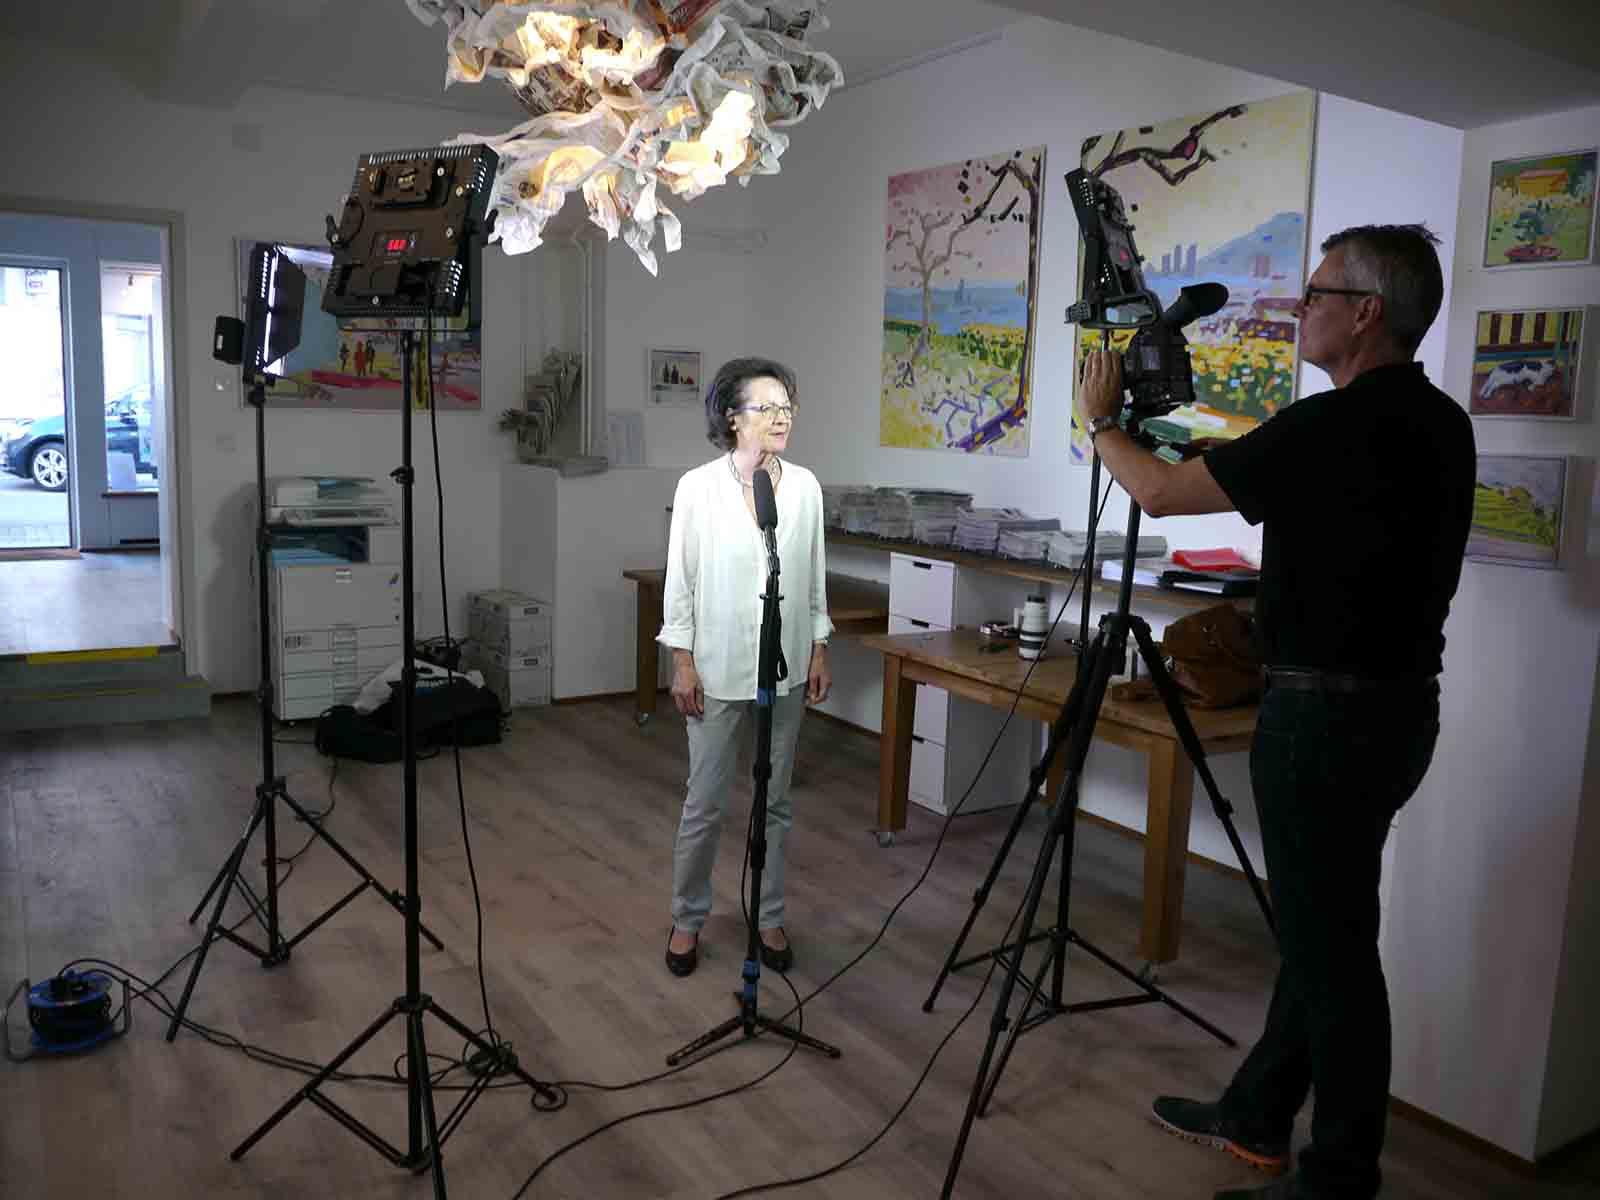 Filmstudio in der Redaktion des «Hönggers»: Christian Mossner, Vizepräsident der Stiftung Höngger Quartierzeitung, filmt und coacht die Präsidentin Franziska Lang.